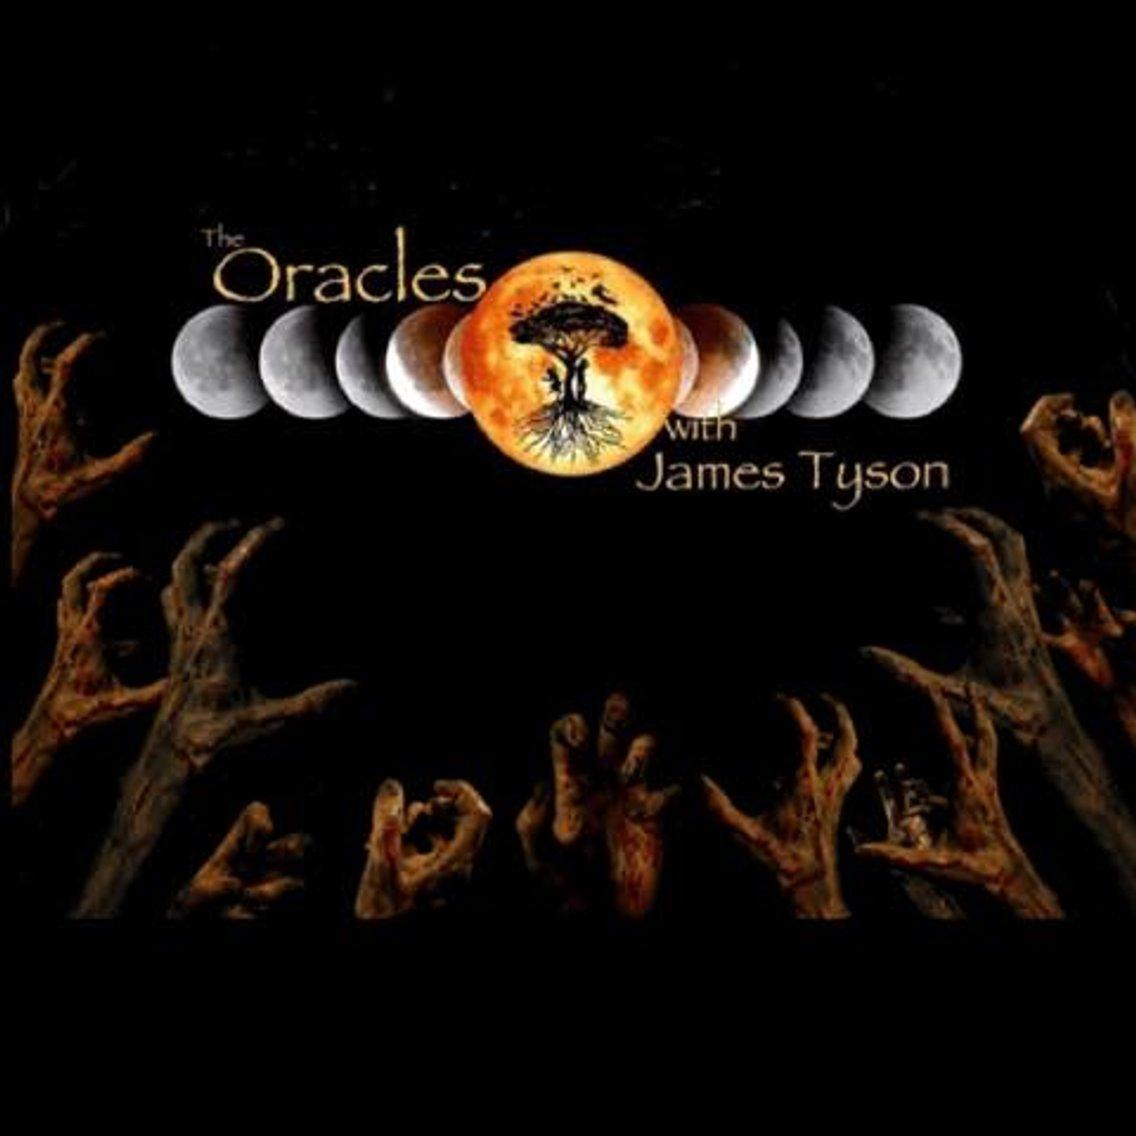 The Oracles with James Tyson - immagine di copertina